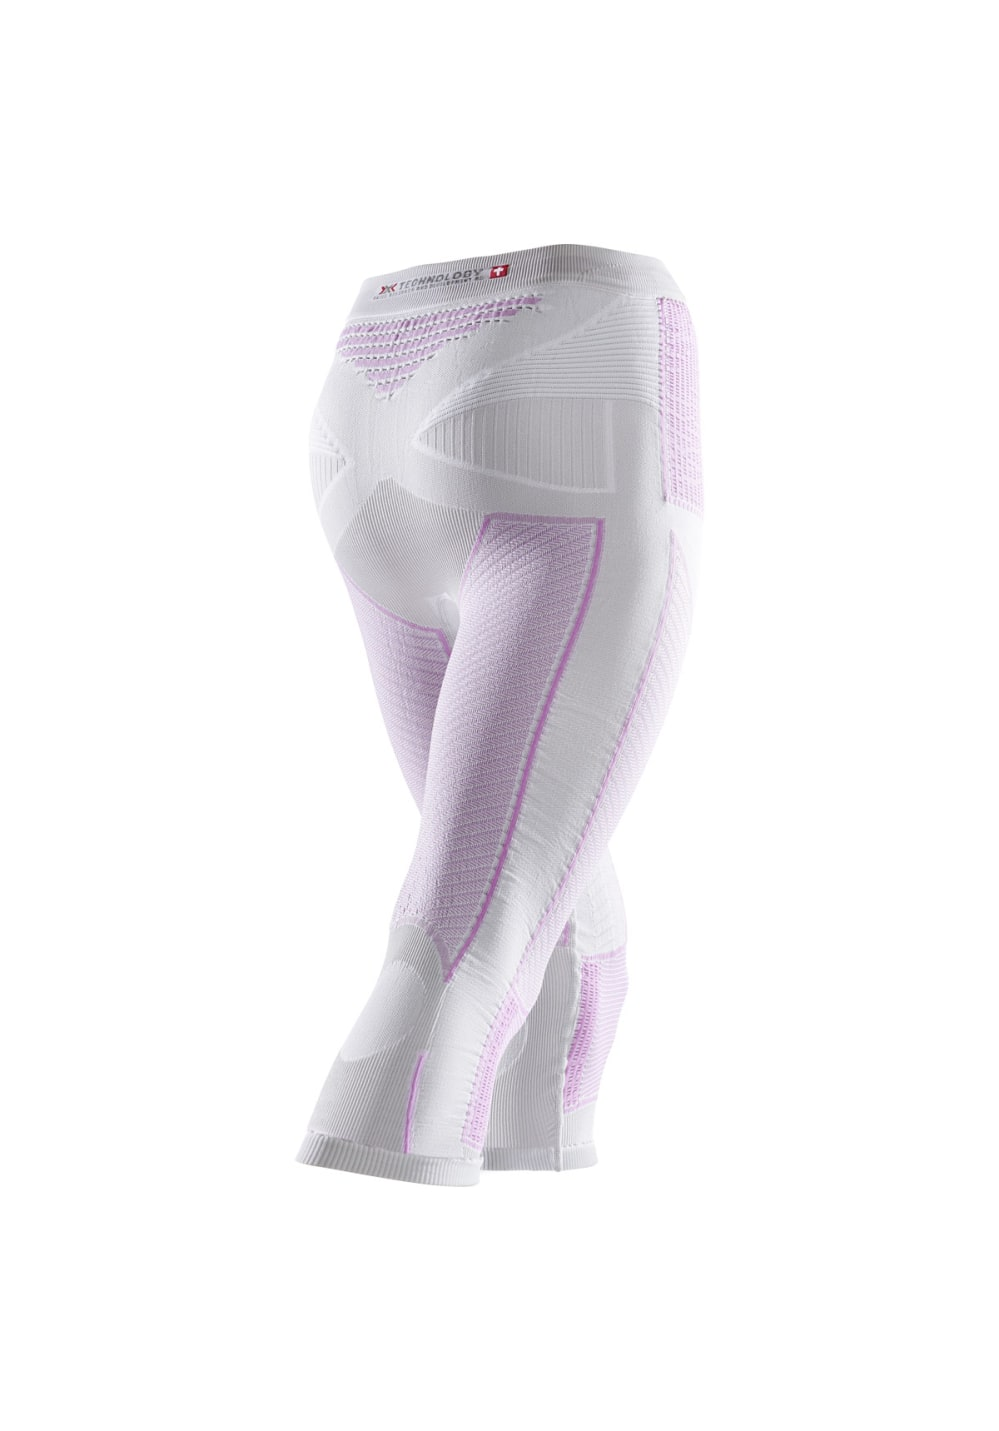 X-Bionic Radiactor Evo Pants Medium - Laufhosen für Damen - Weiß, Gr. XS